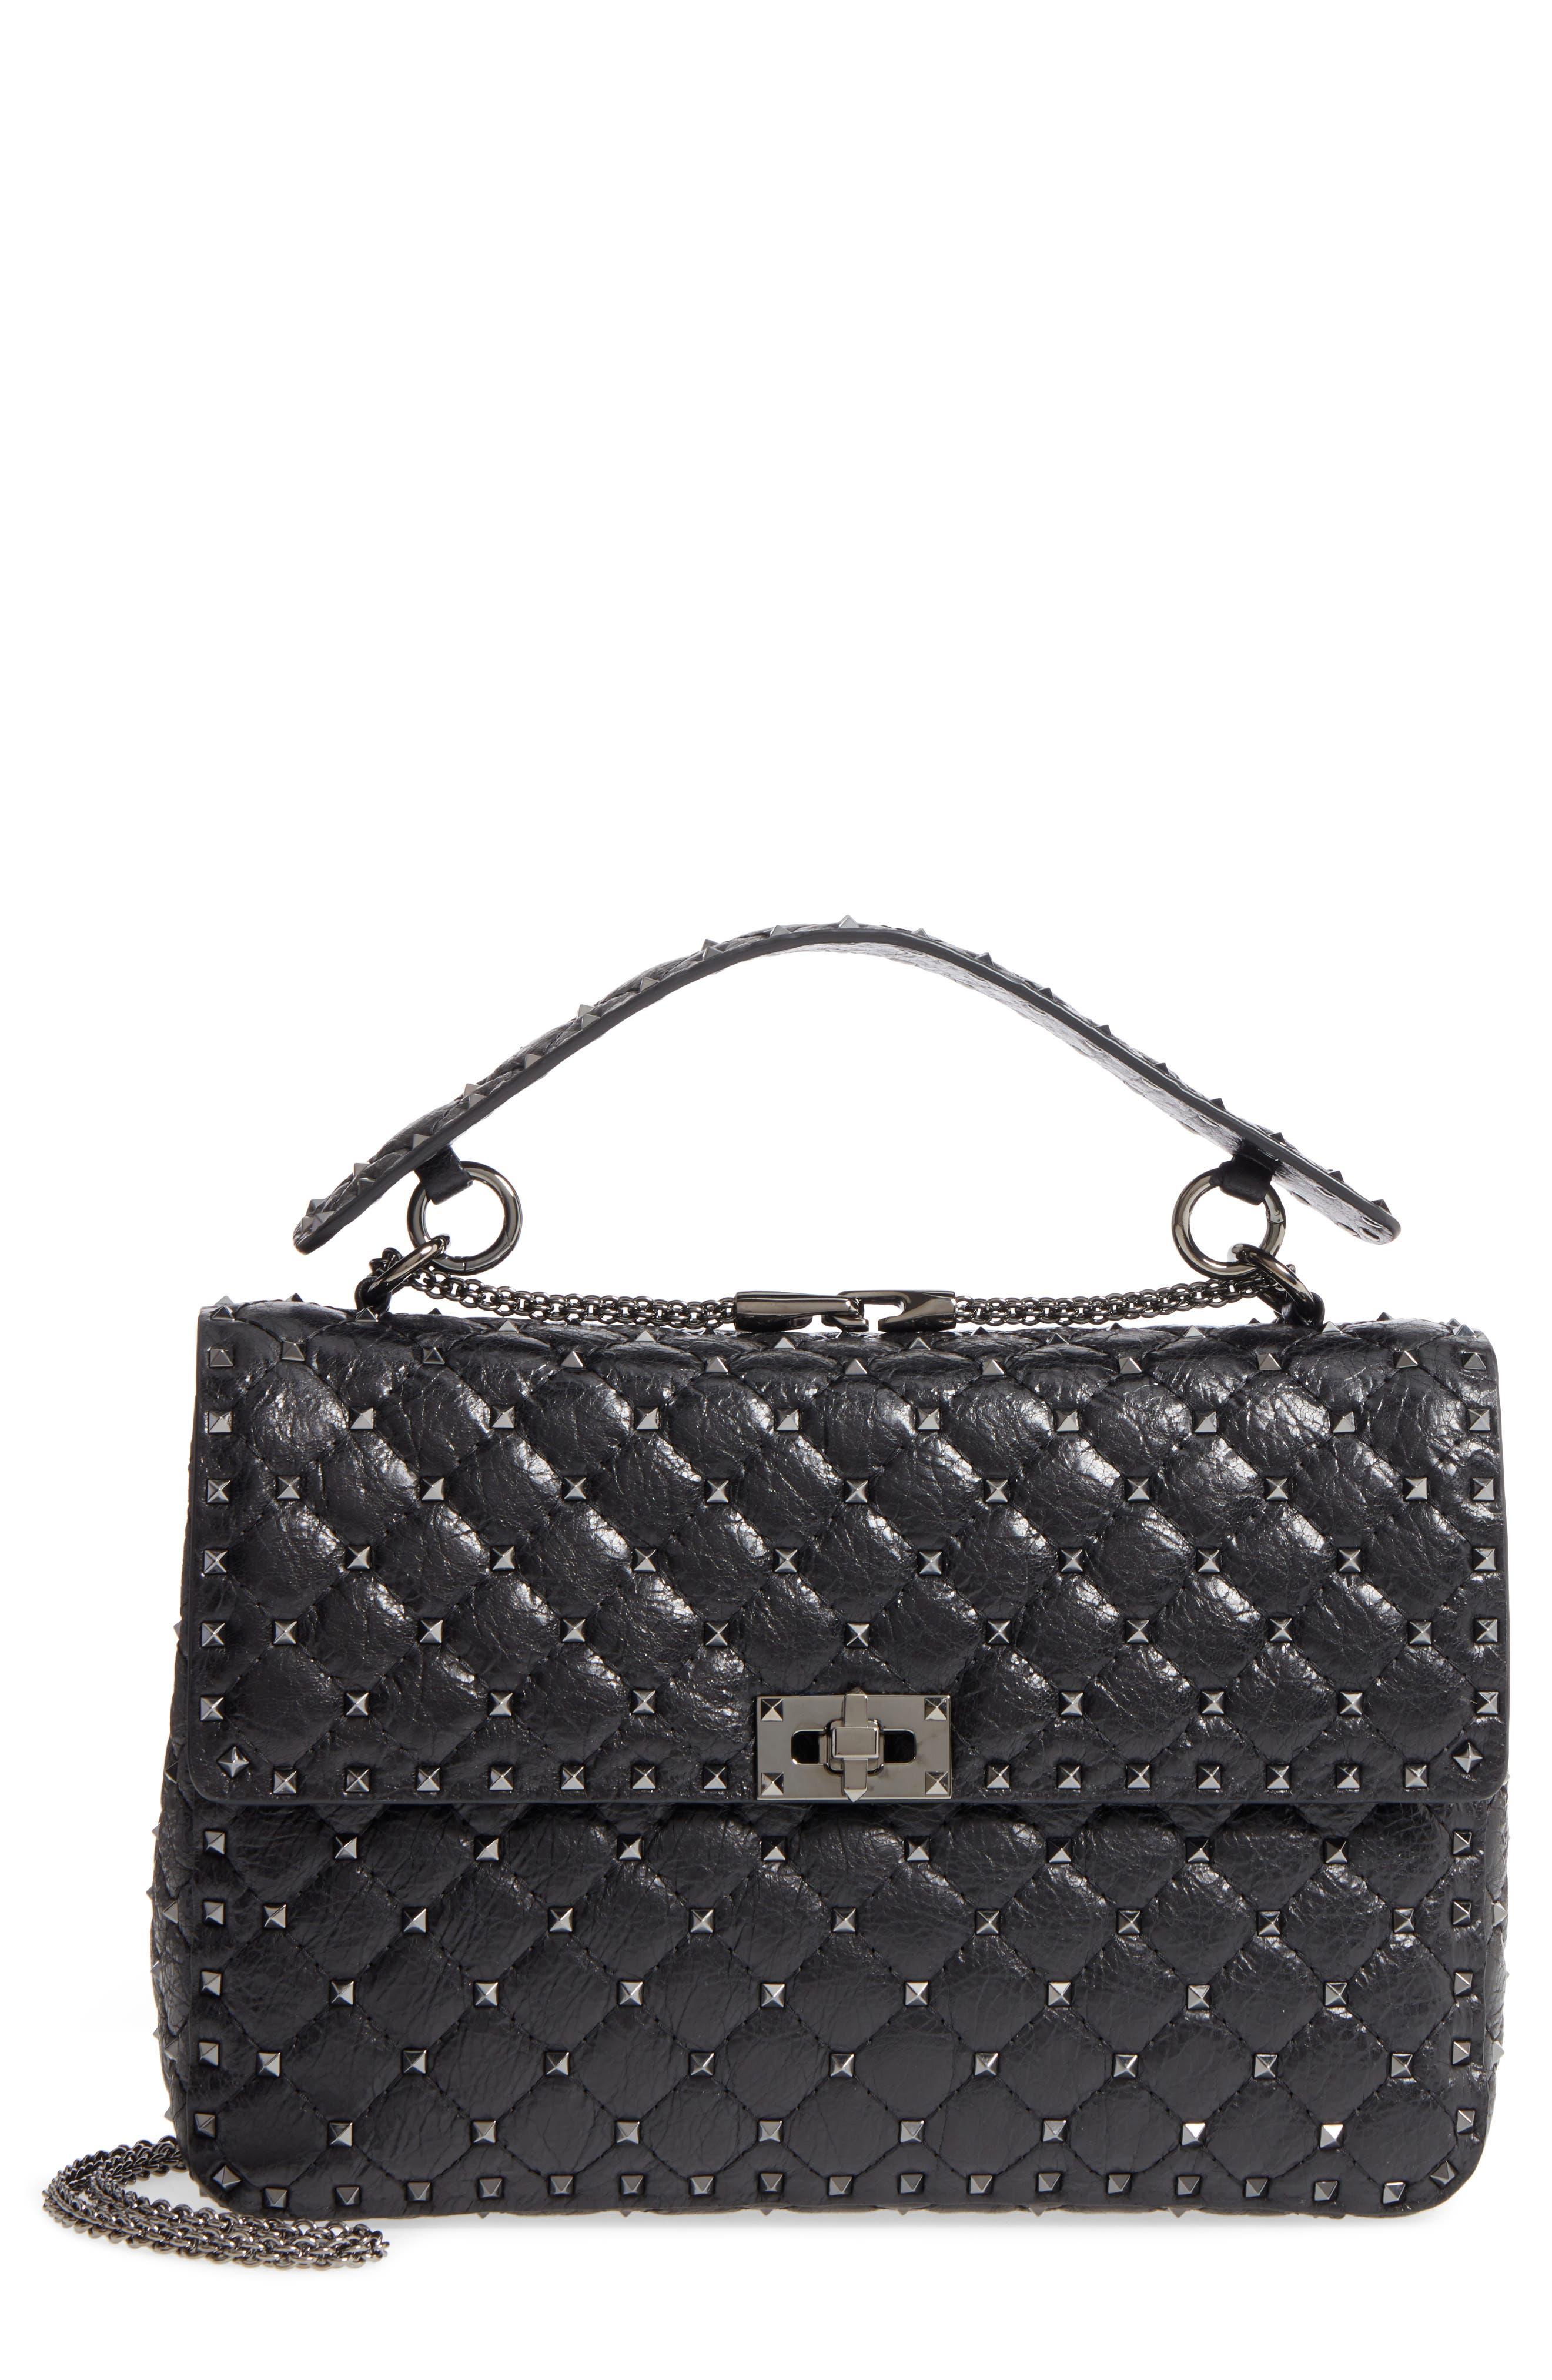 Vitello Rockstud Lambskin Leather Shoulder Bag,                             Main thumbnail 1, color,                             Nero